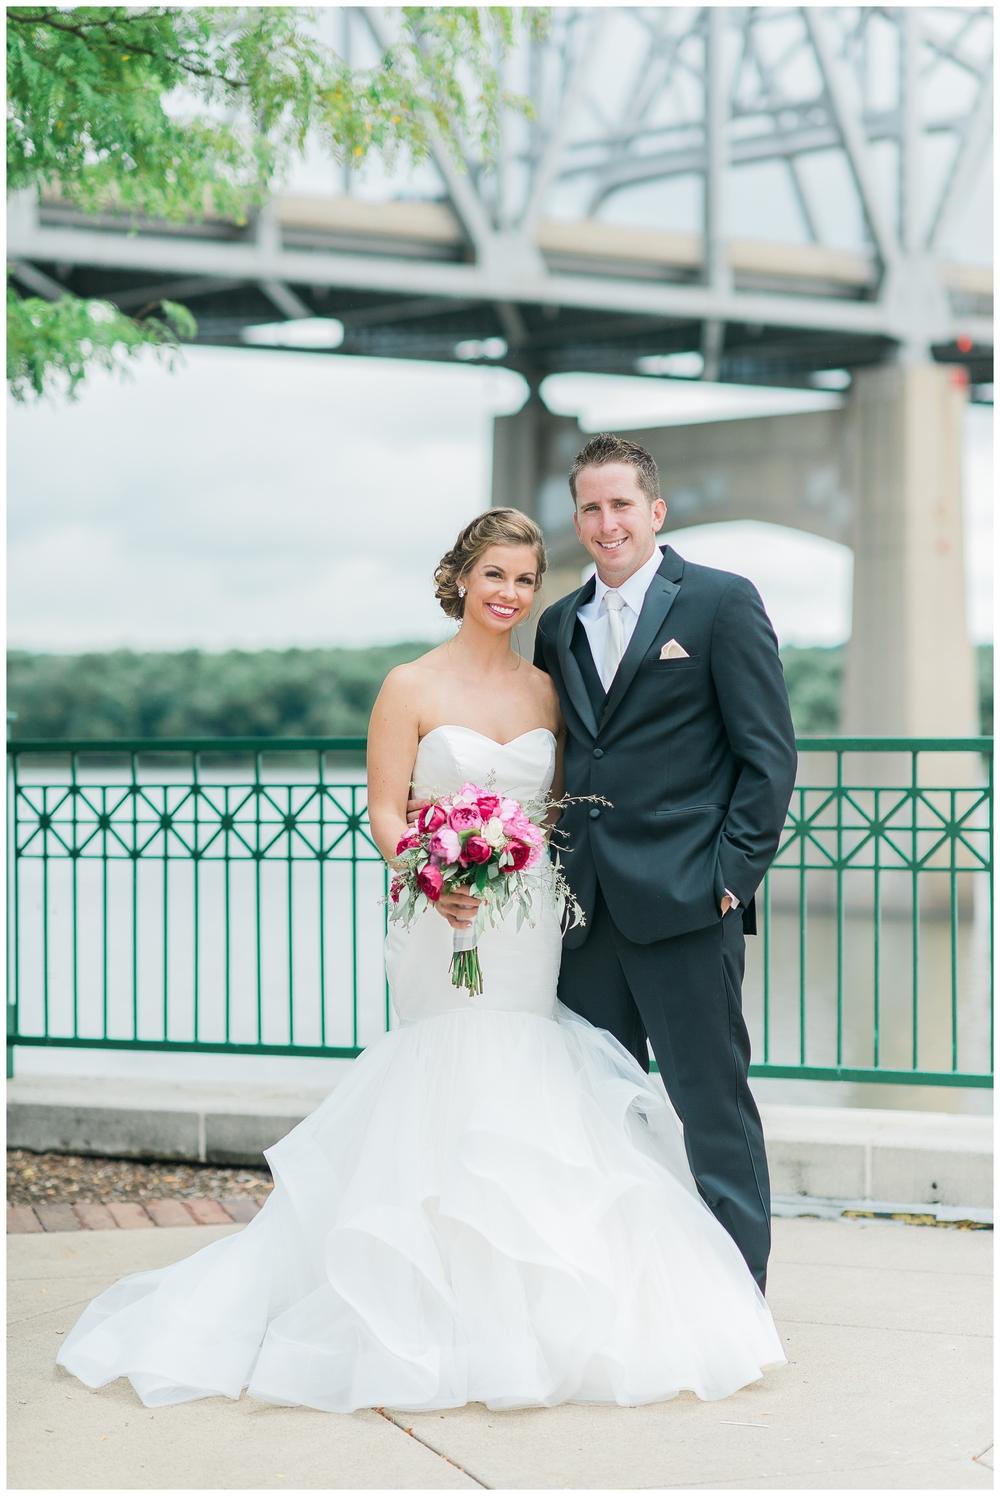 Rebecca_Bridges_Photography_Indianapolis_Wedding_Photographer_5021.jpg